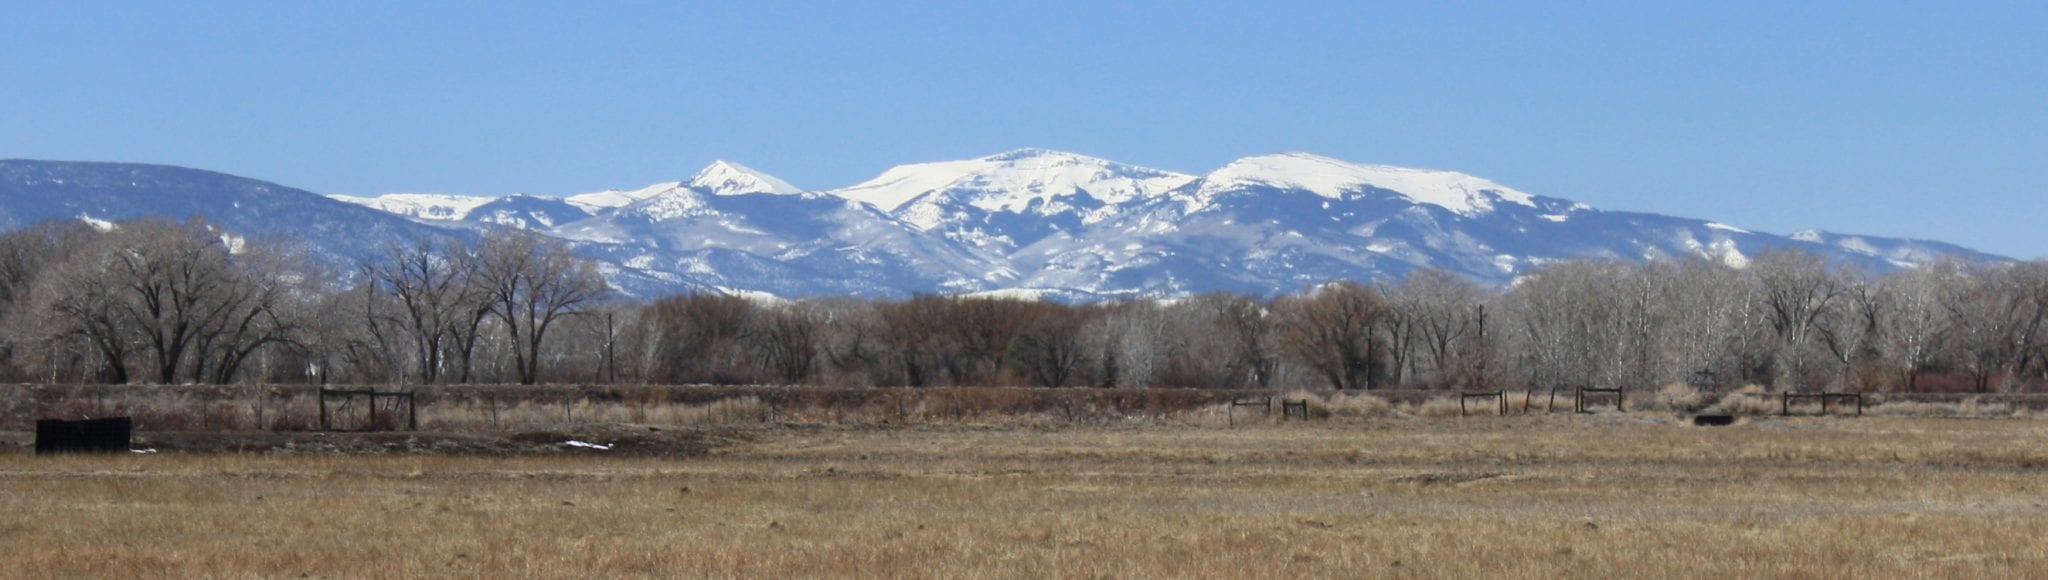 Bennett Peak, Colorado